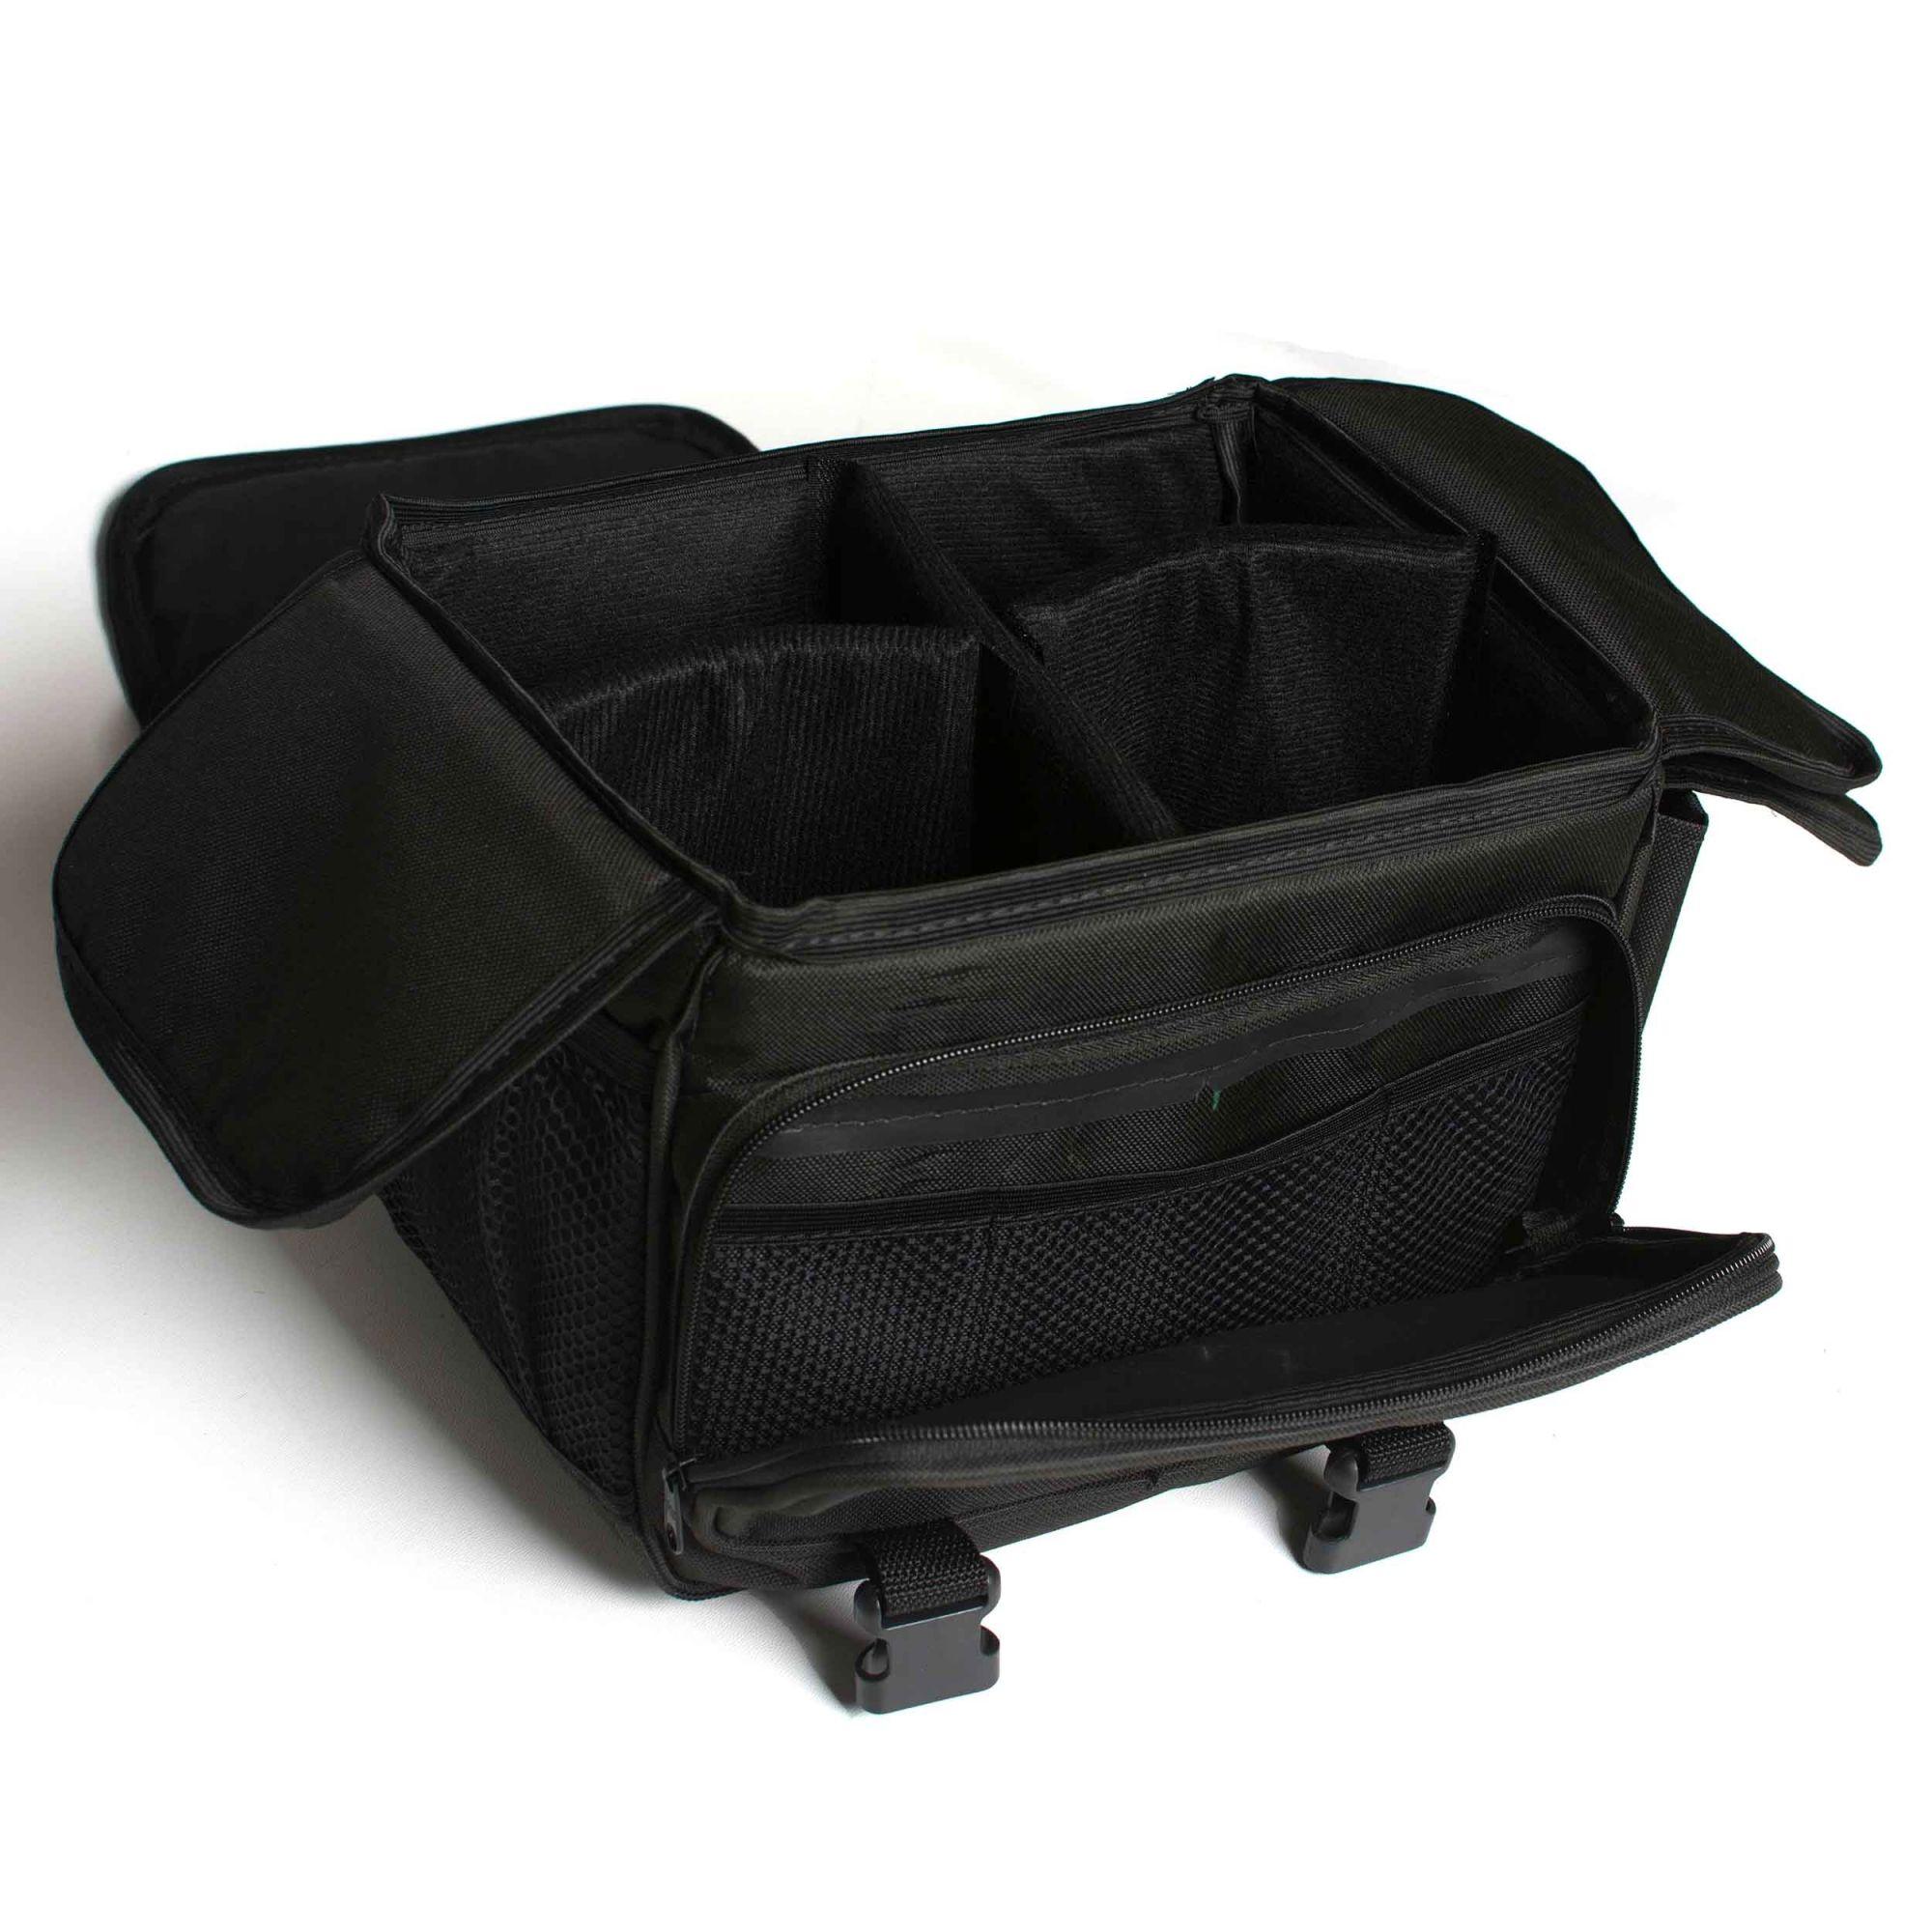 Maleta fotografica profissional Master Bag